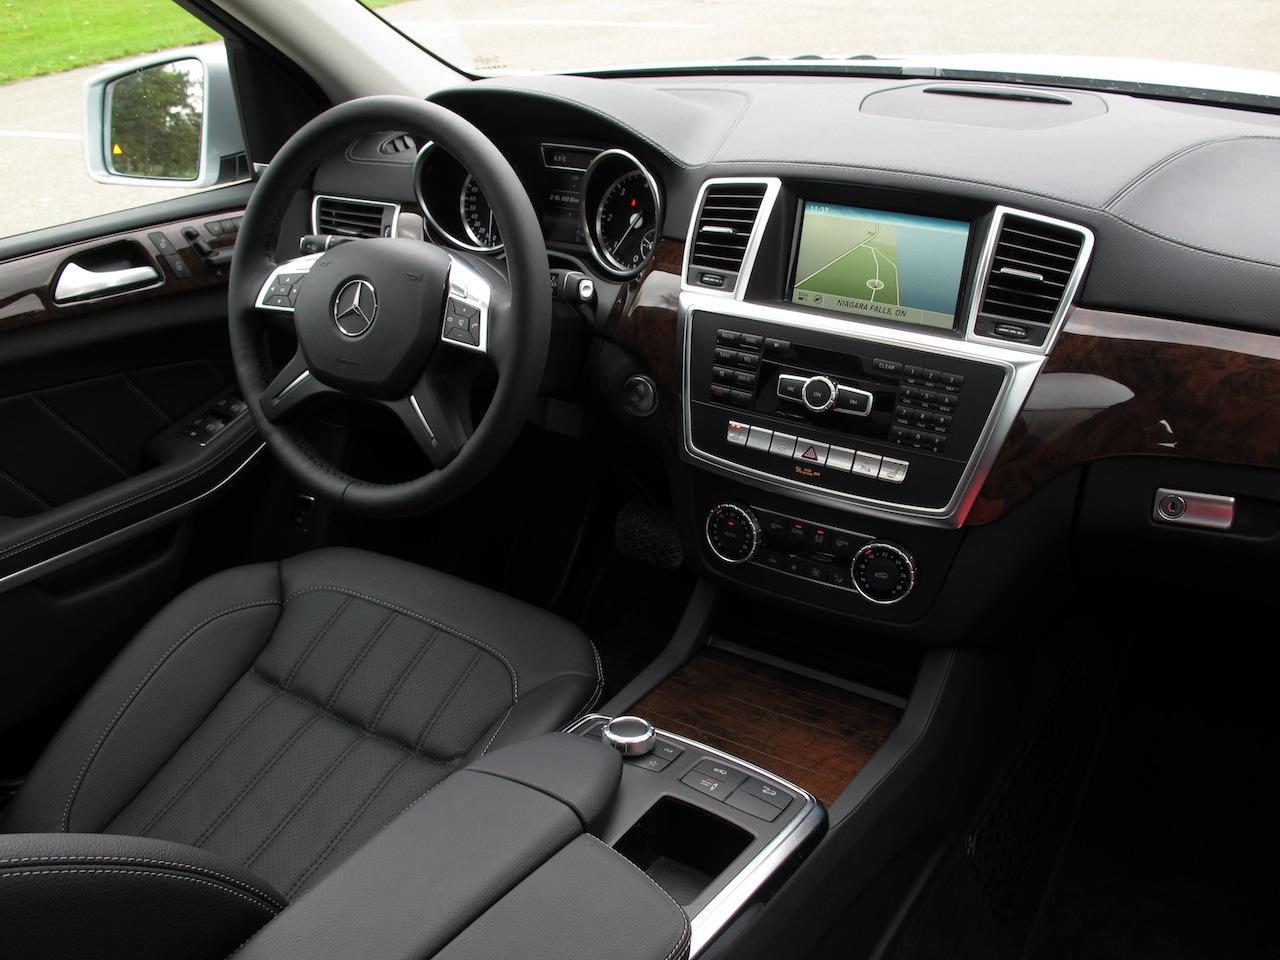 2014 Mercedes-Benz GL350 Bluetec Photo Gallery - Cars ...